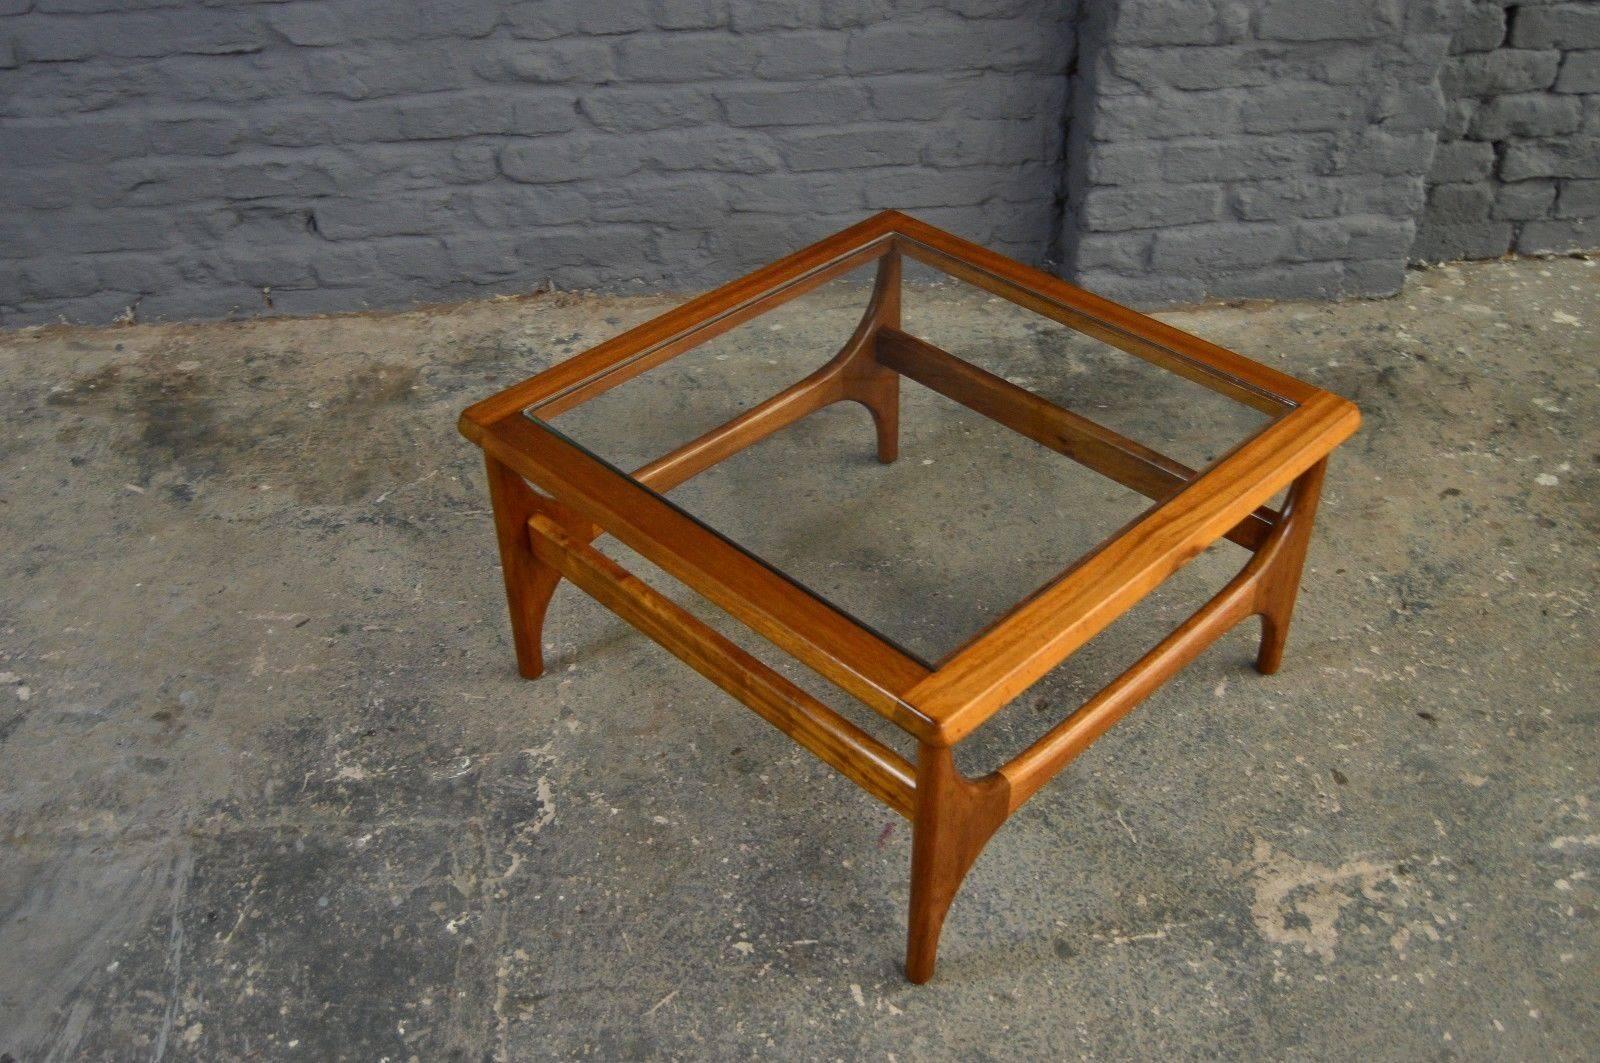 Retro Vintage Mid Century Teak Glass Square Coffee Table Danish Regarding Retro Teak Glass Coffee Tables (View 15 of 30)